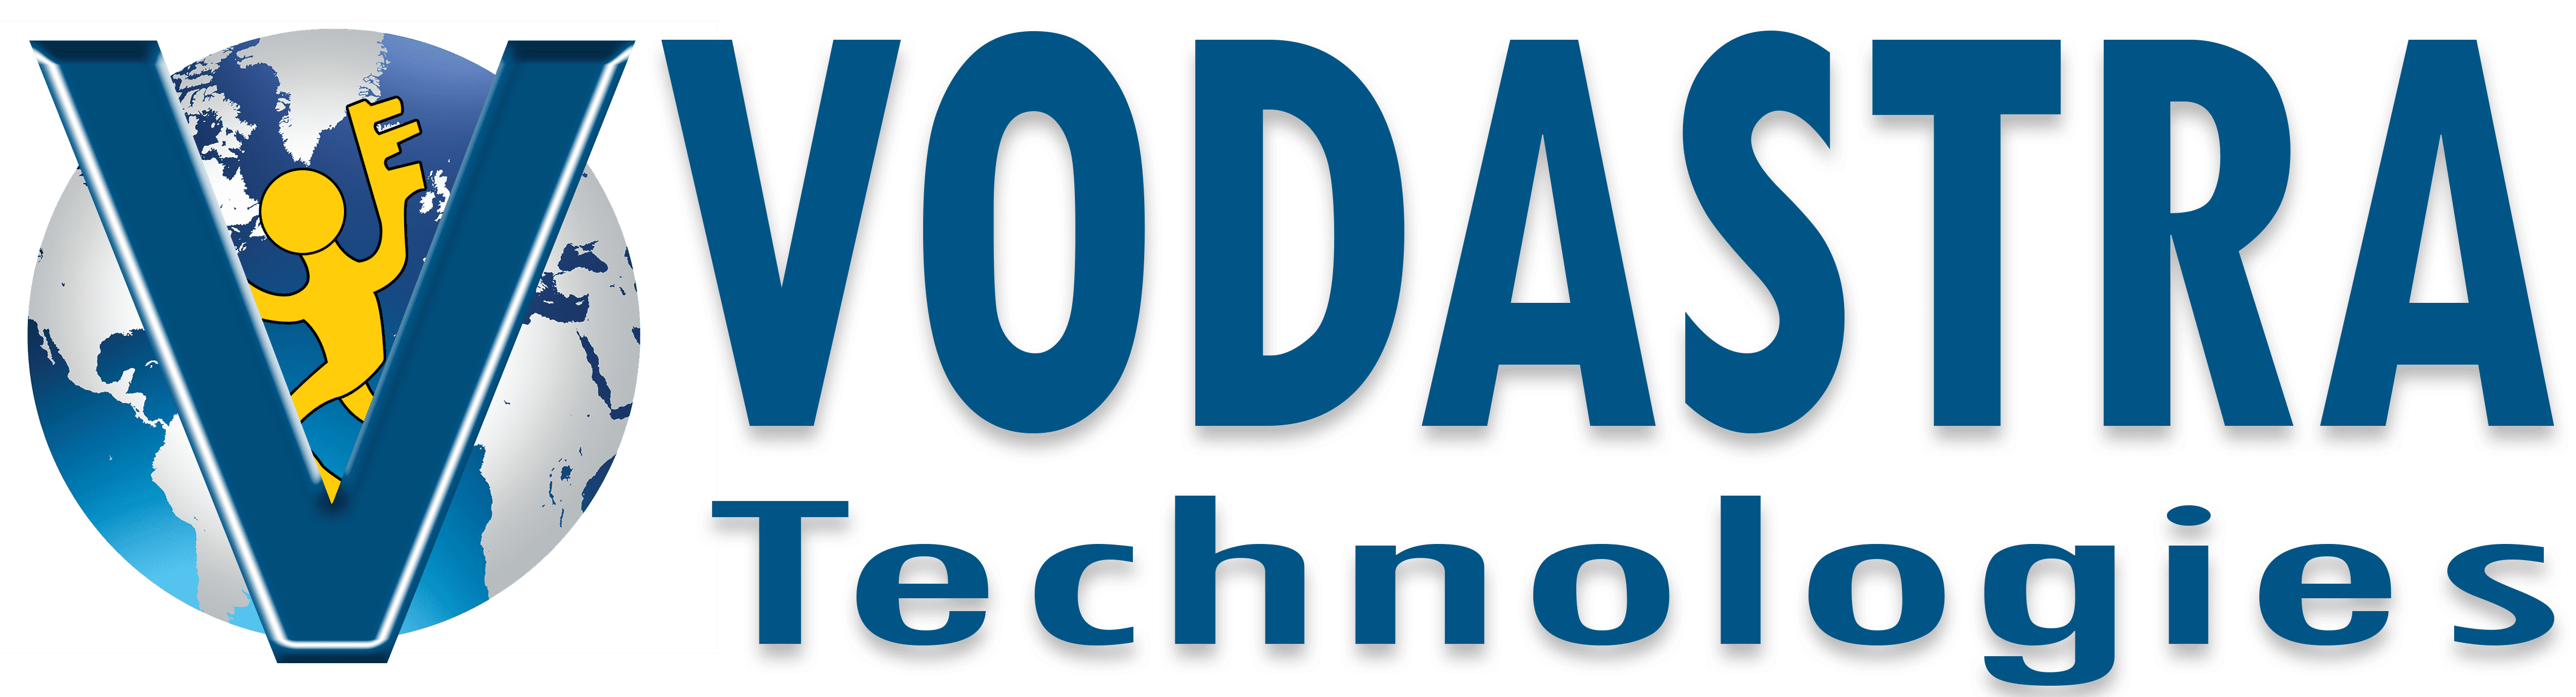 Vodastra Technologies